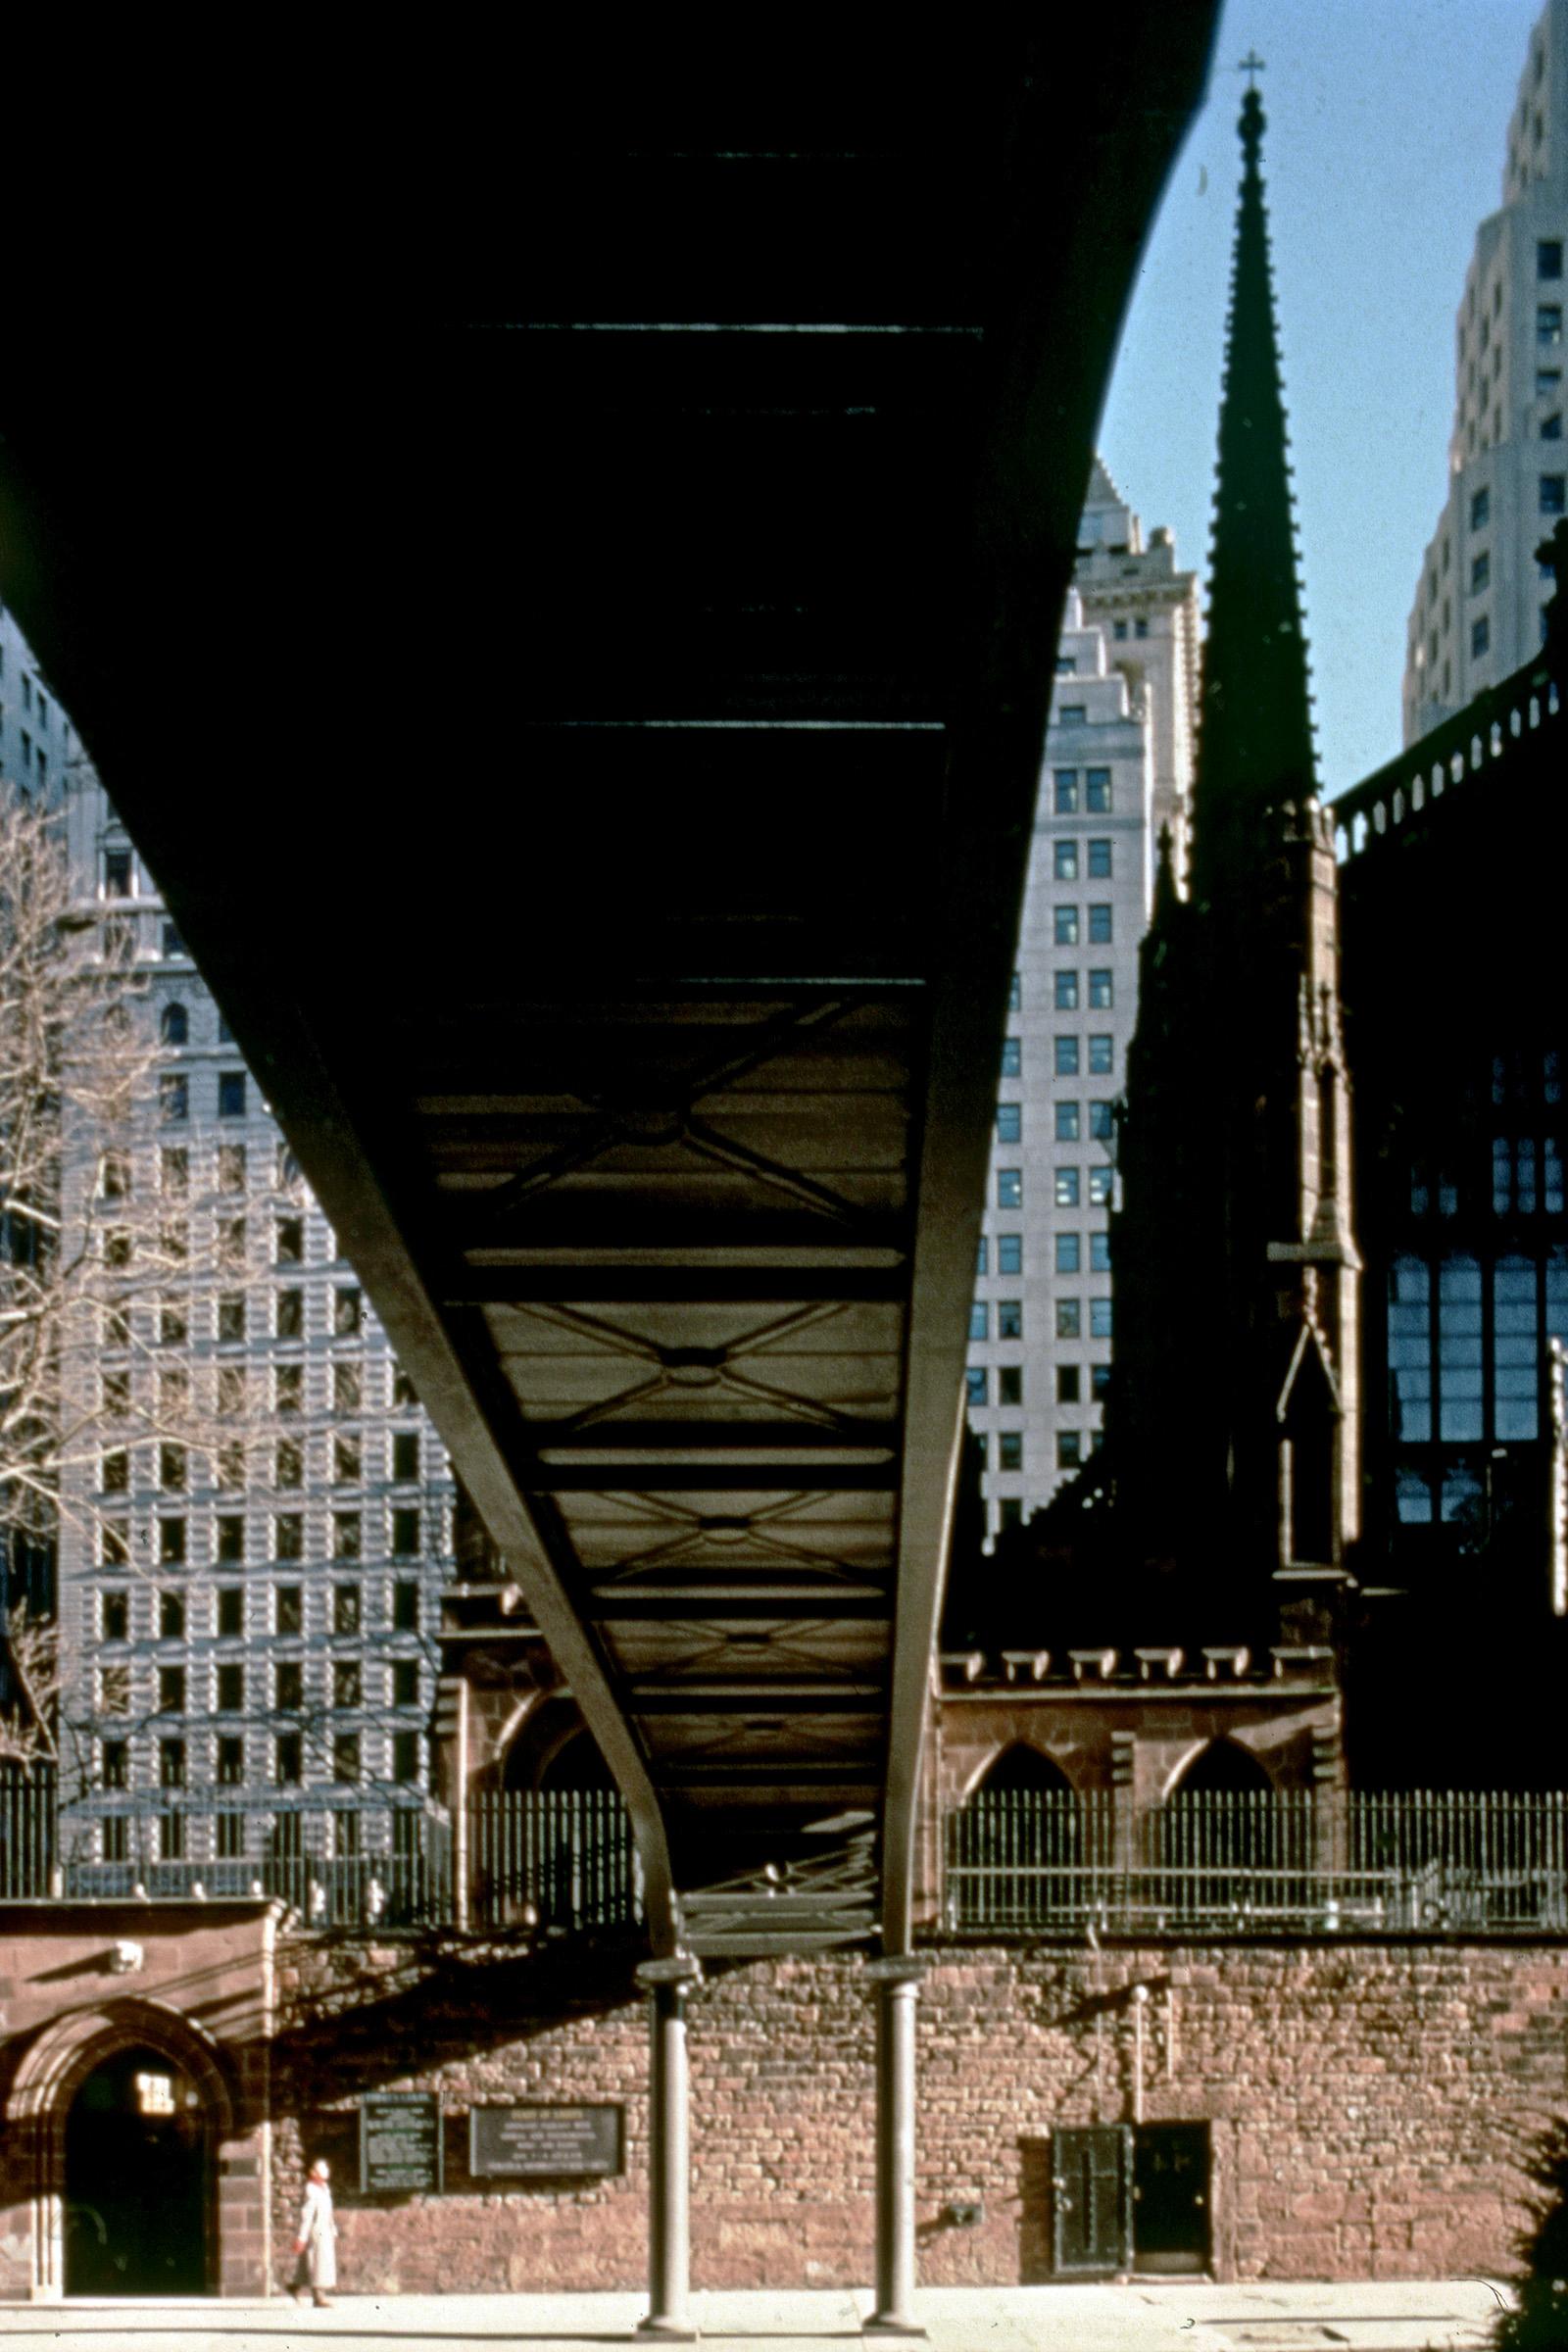 Trinity - Bridge Shot From Underneath.jpg